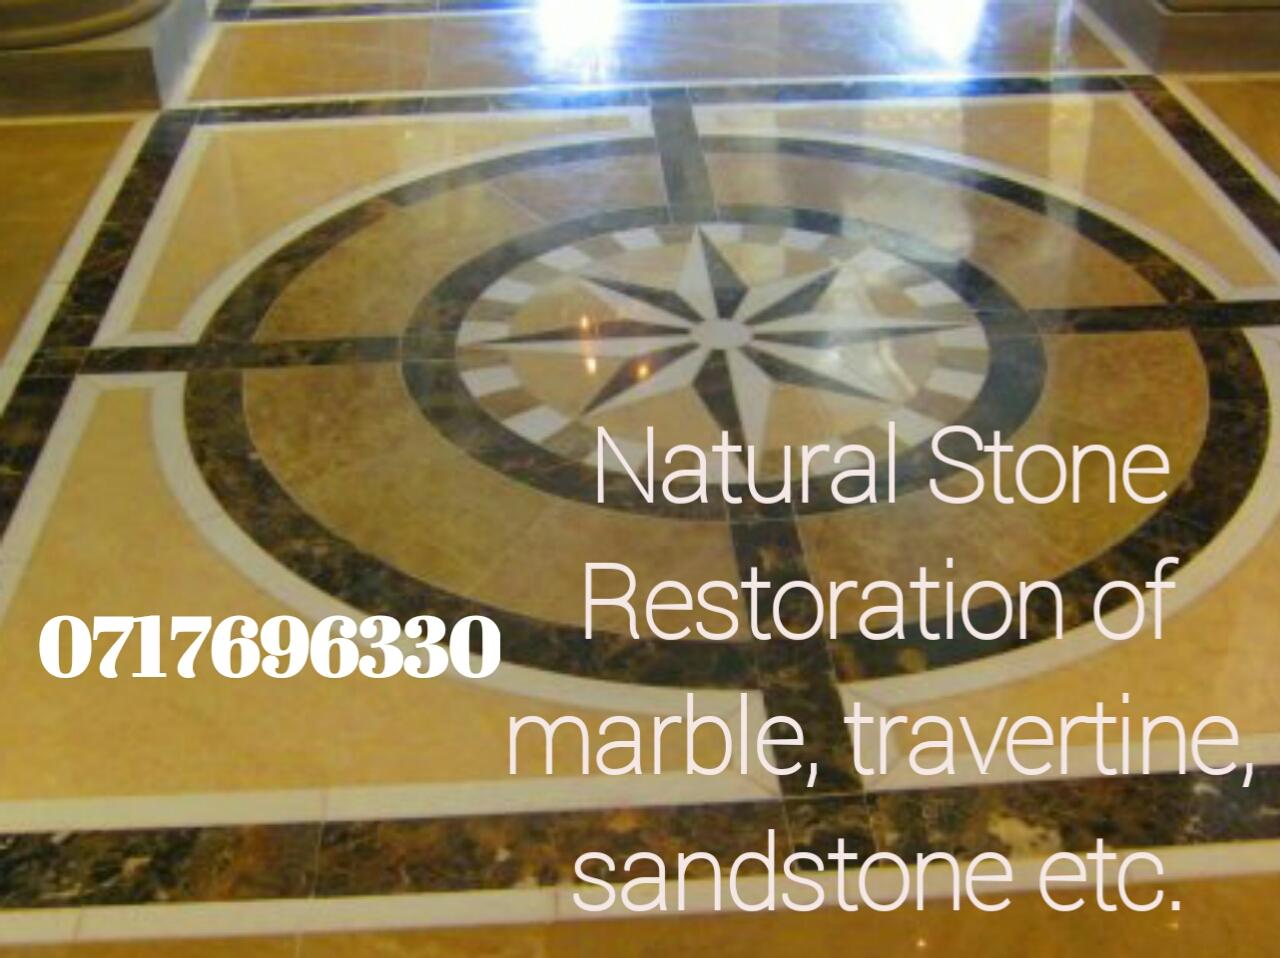 NATURAL STONE RESTORATION OF MARBLE, TRAVERTINE, TERRAZZO, SLATE, GRANITE ETC